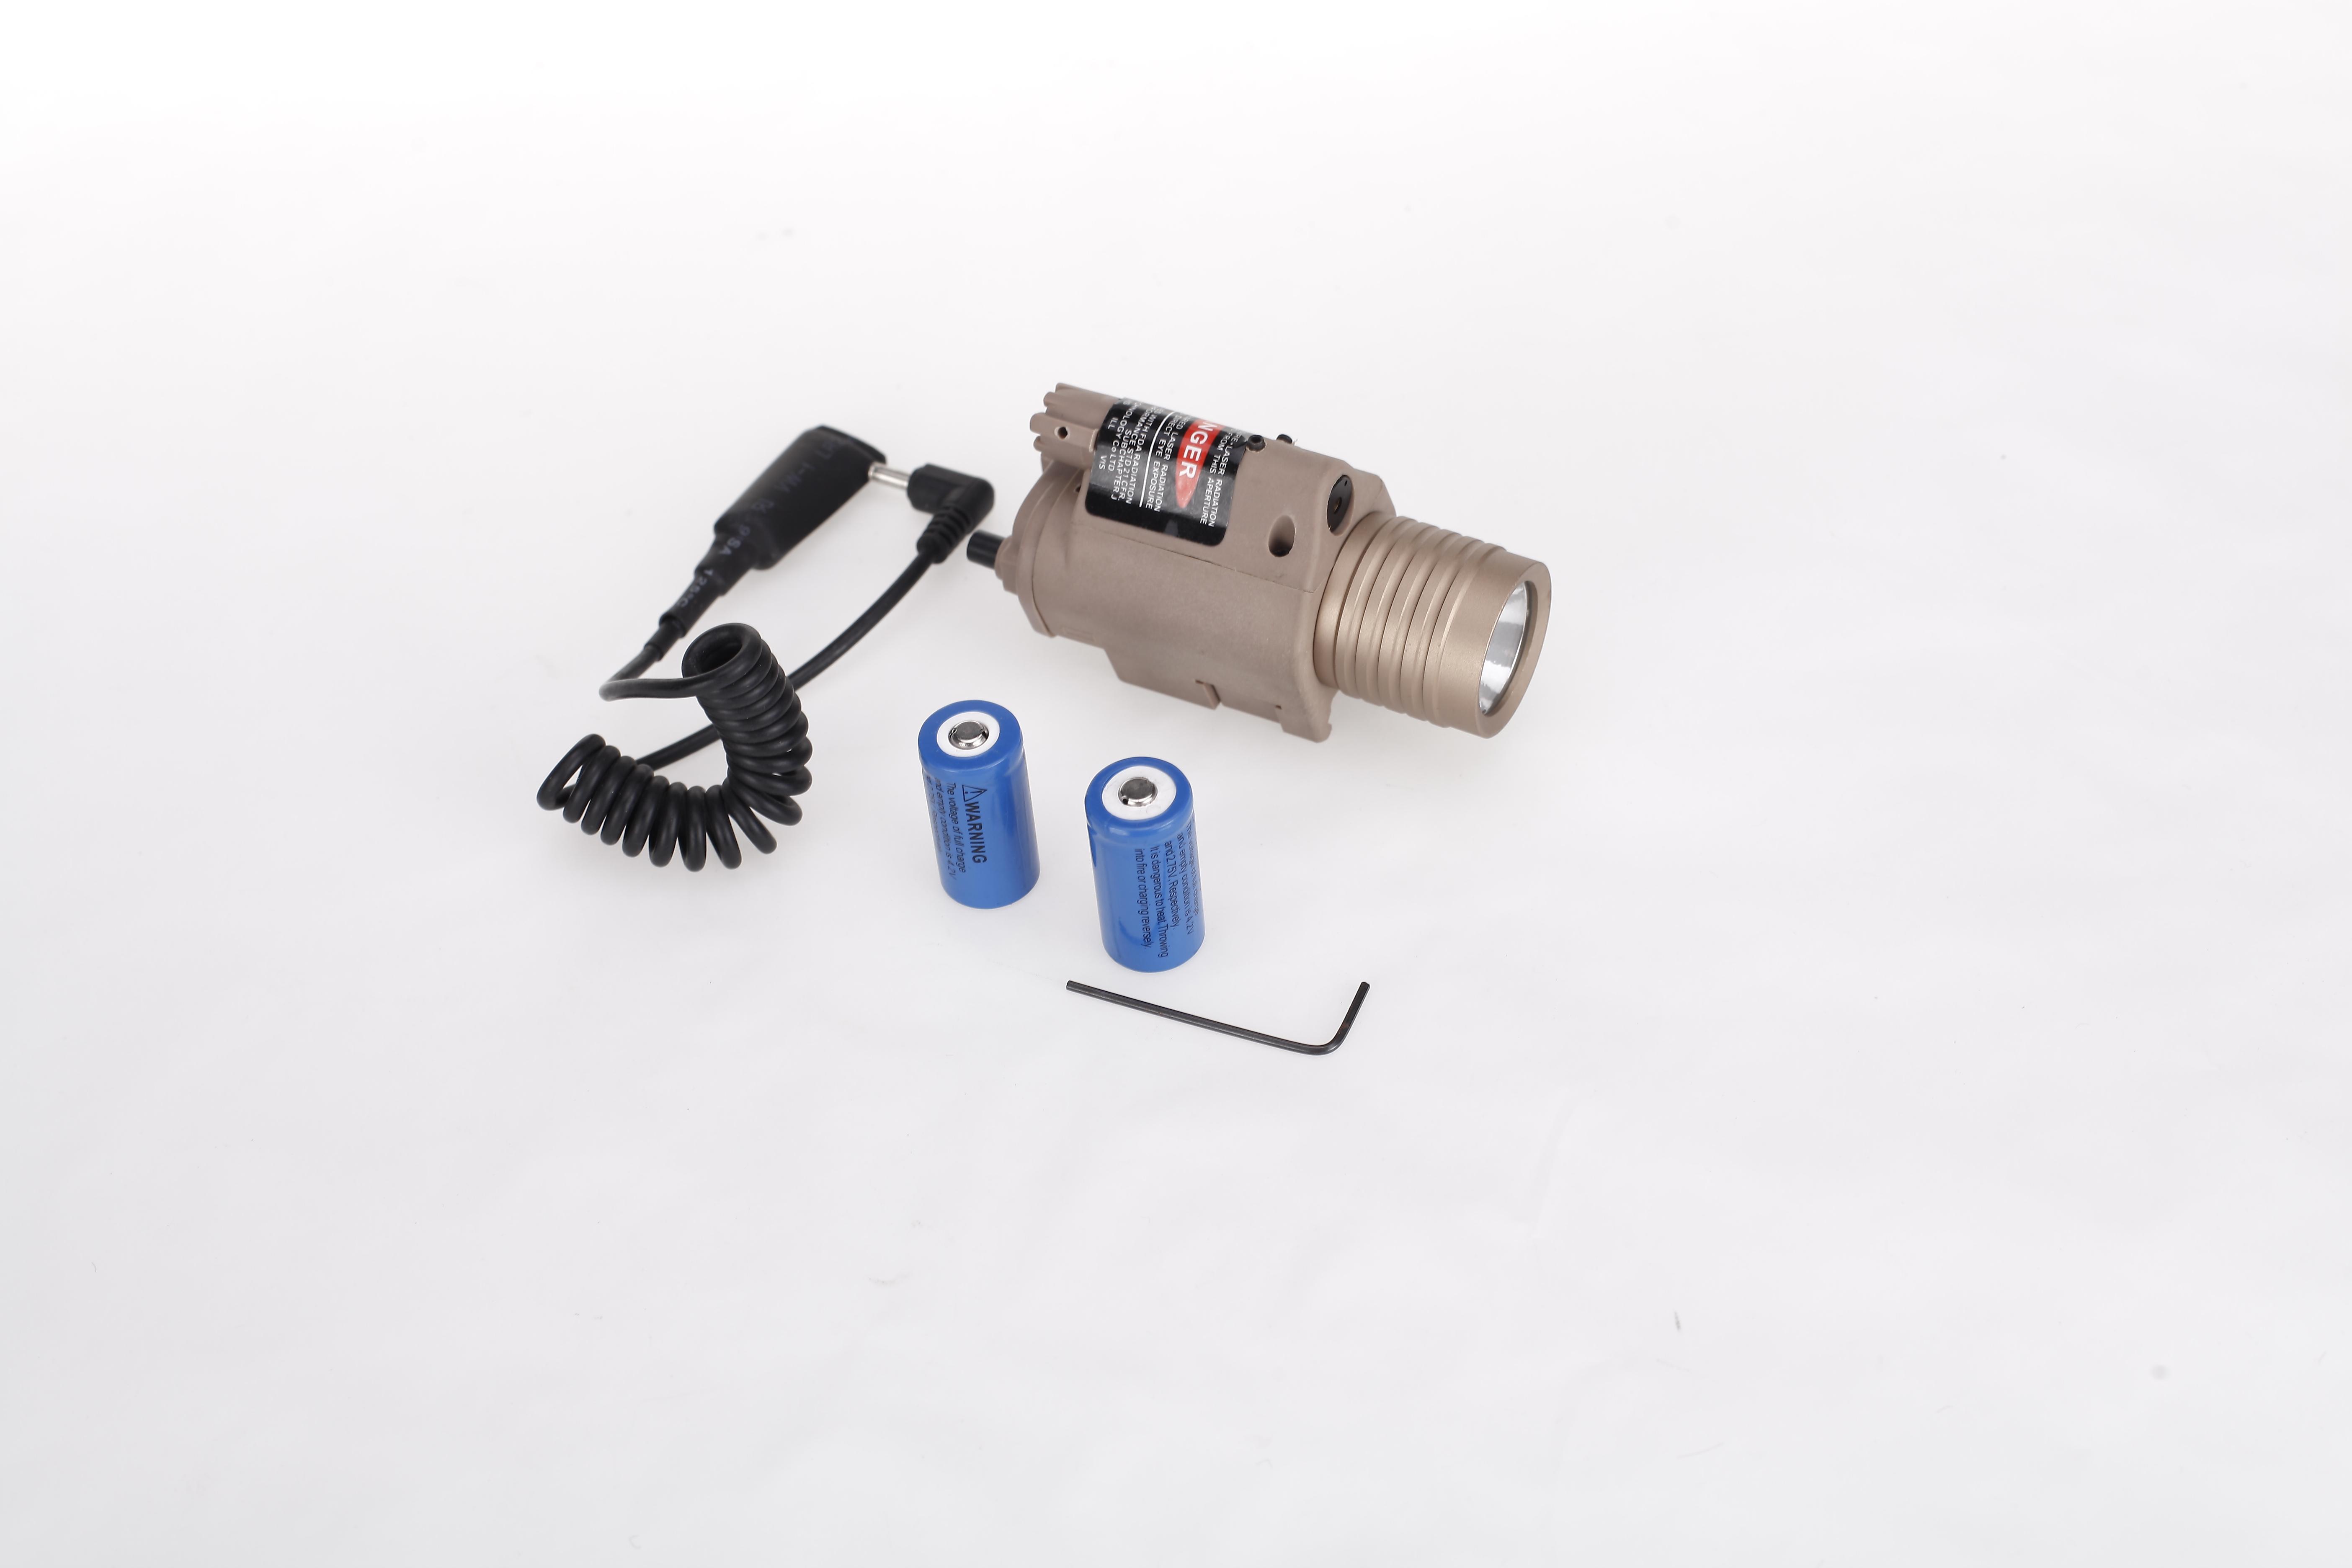 3MW Red Laser Sight Laser Scope with LED Flashlight